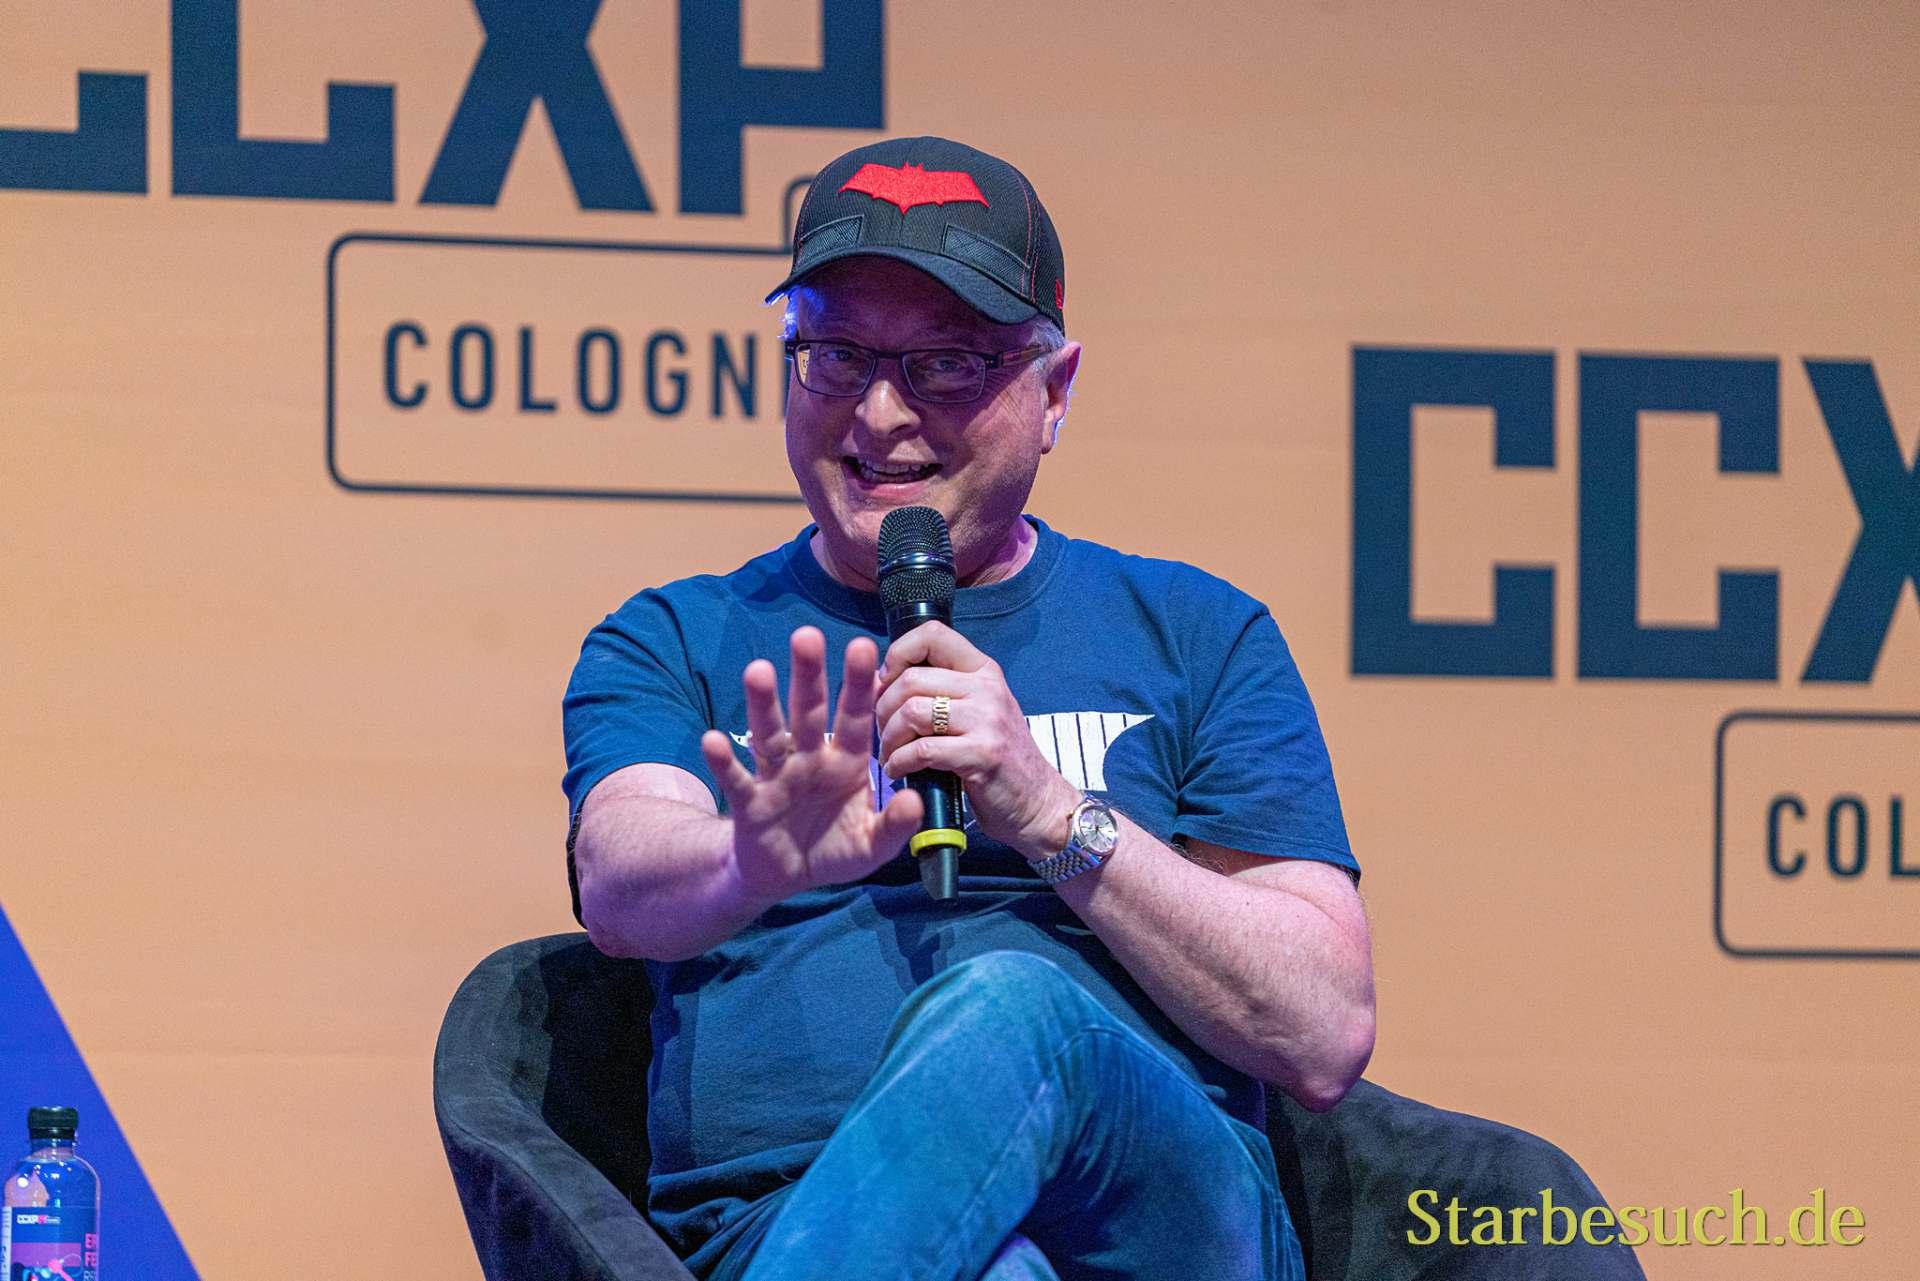 COLOGNE, GERMANY - JUN 28th 2019: Michael Uslan at CCXP Cologne